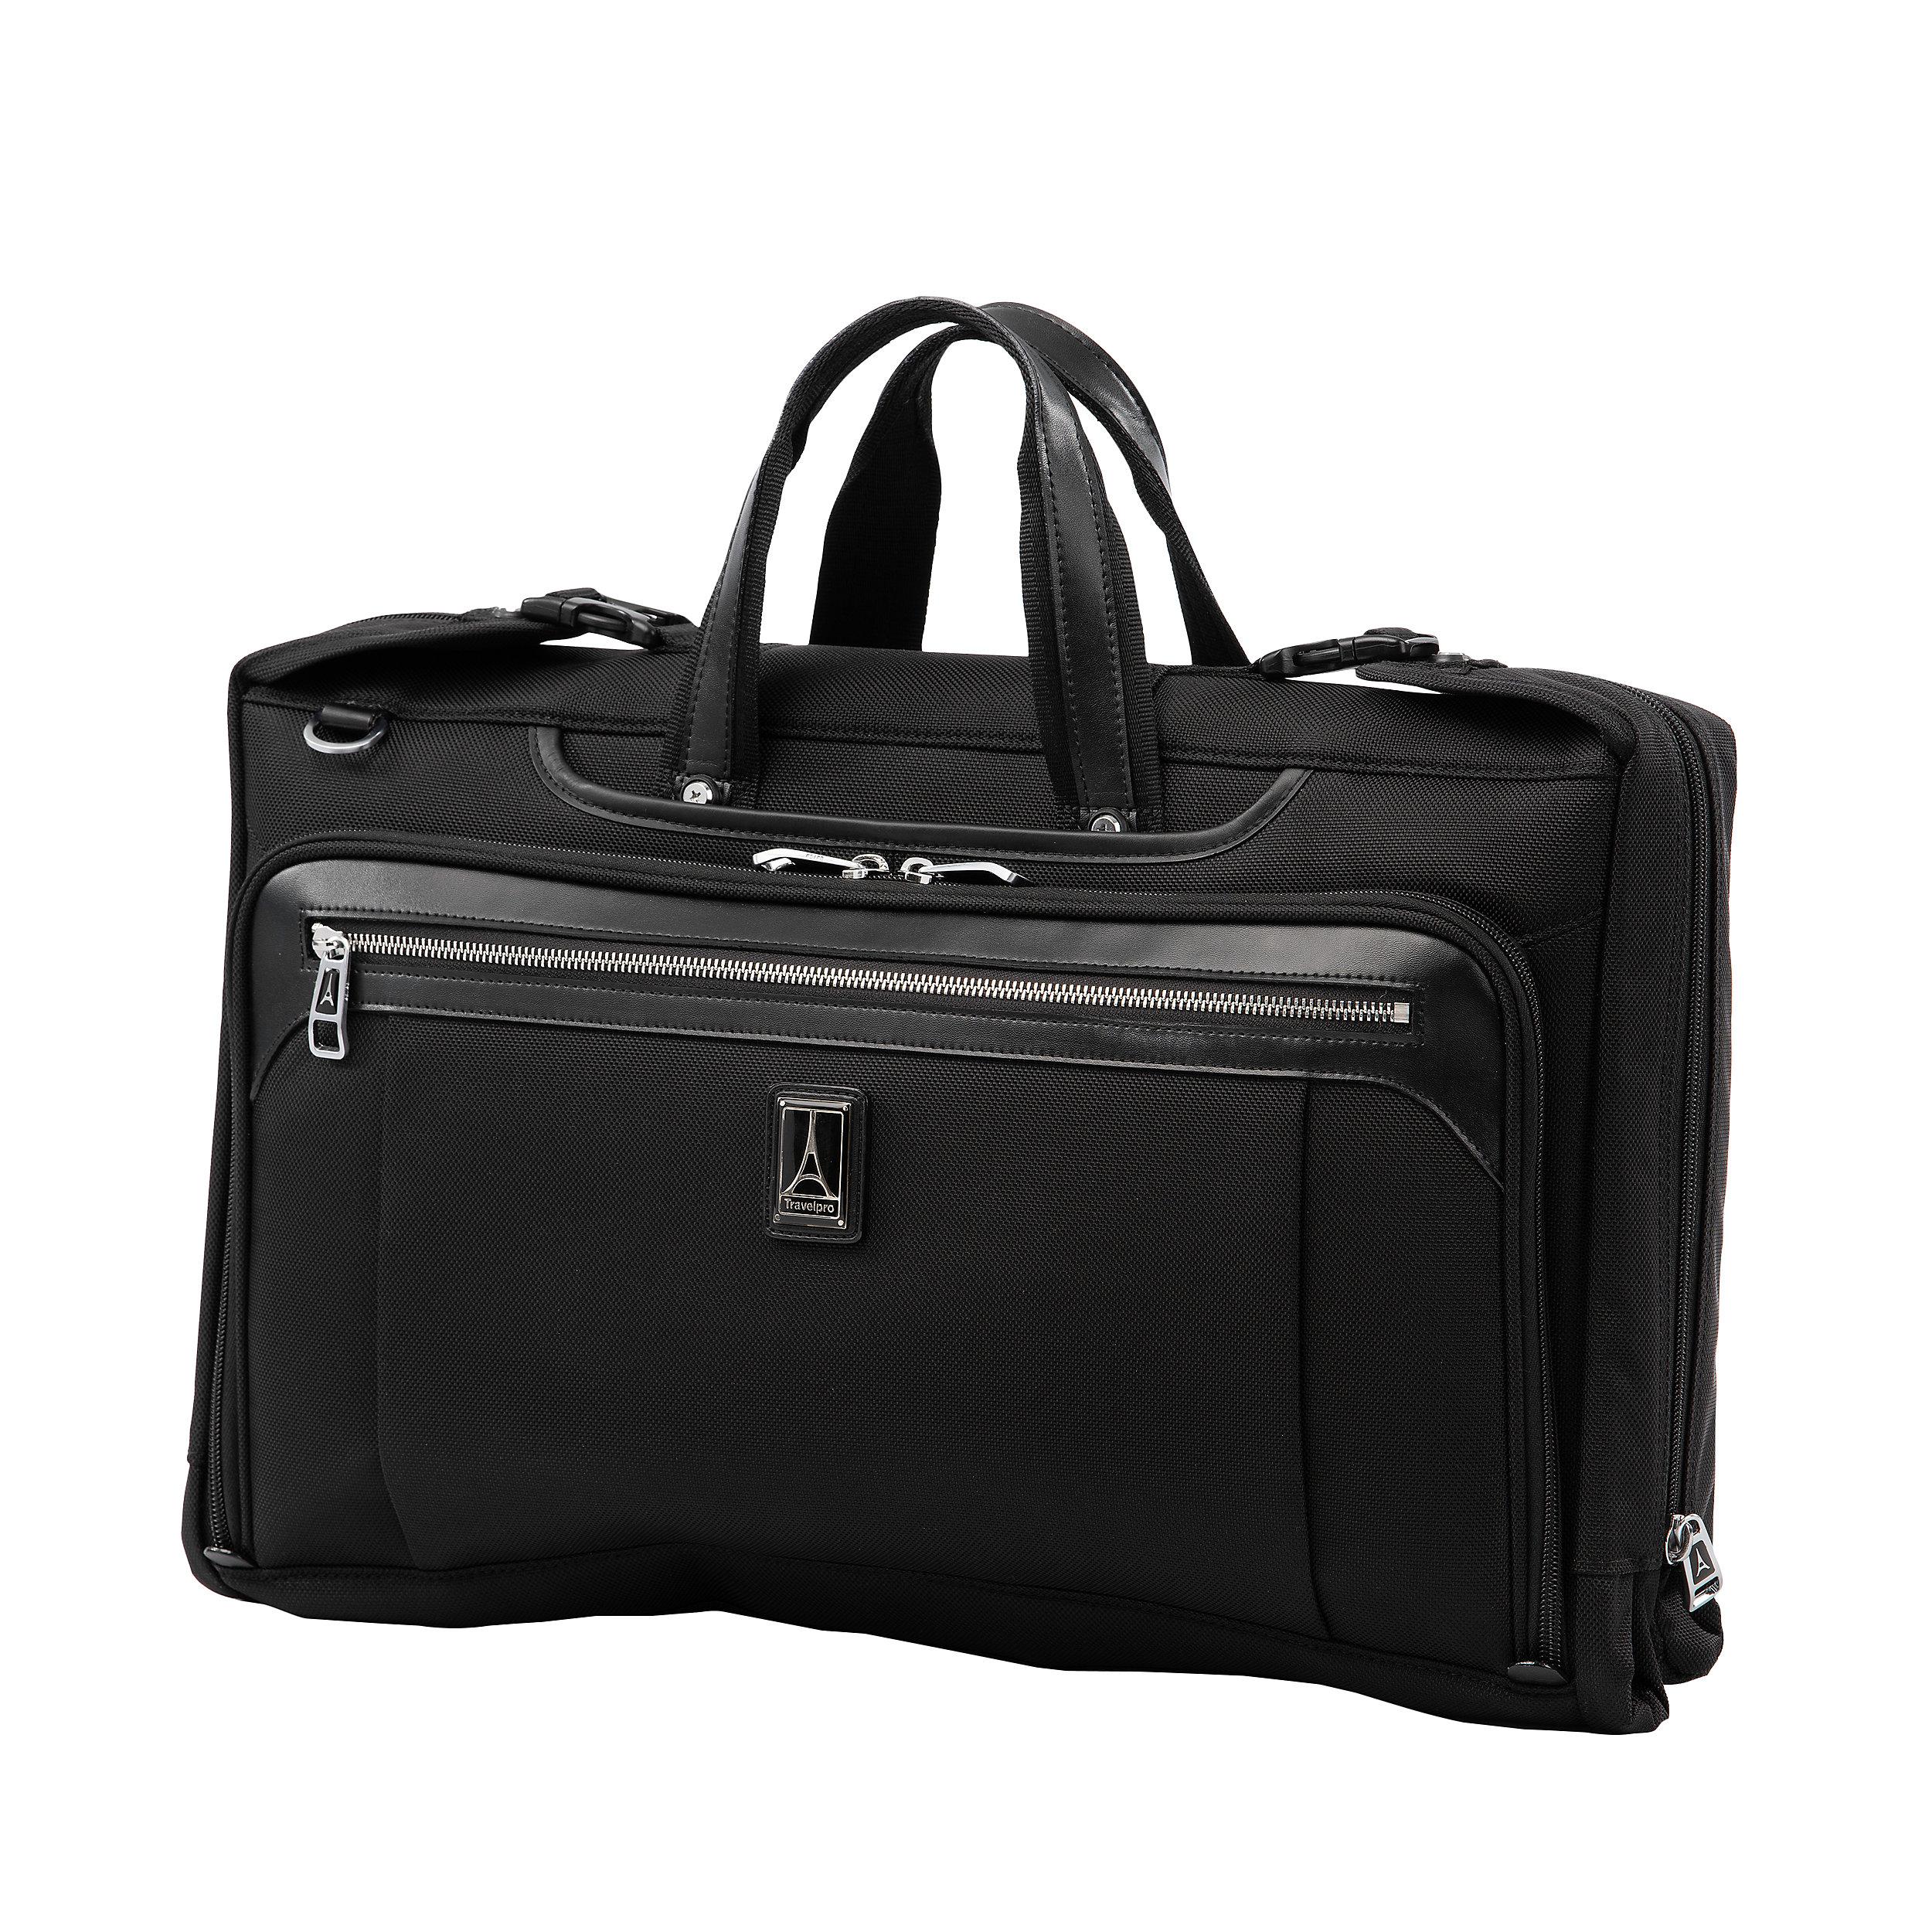 Garment Bag Tri-Fold Carry-on Platinum Elite Extra Small 20 Liter